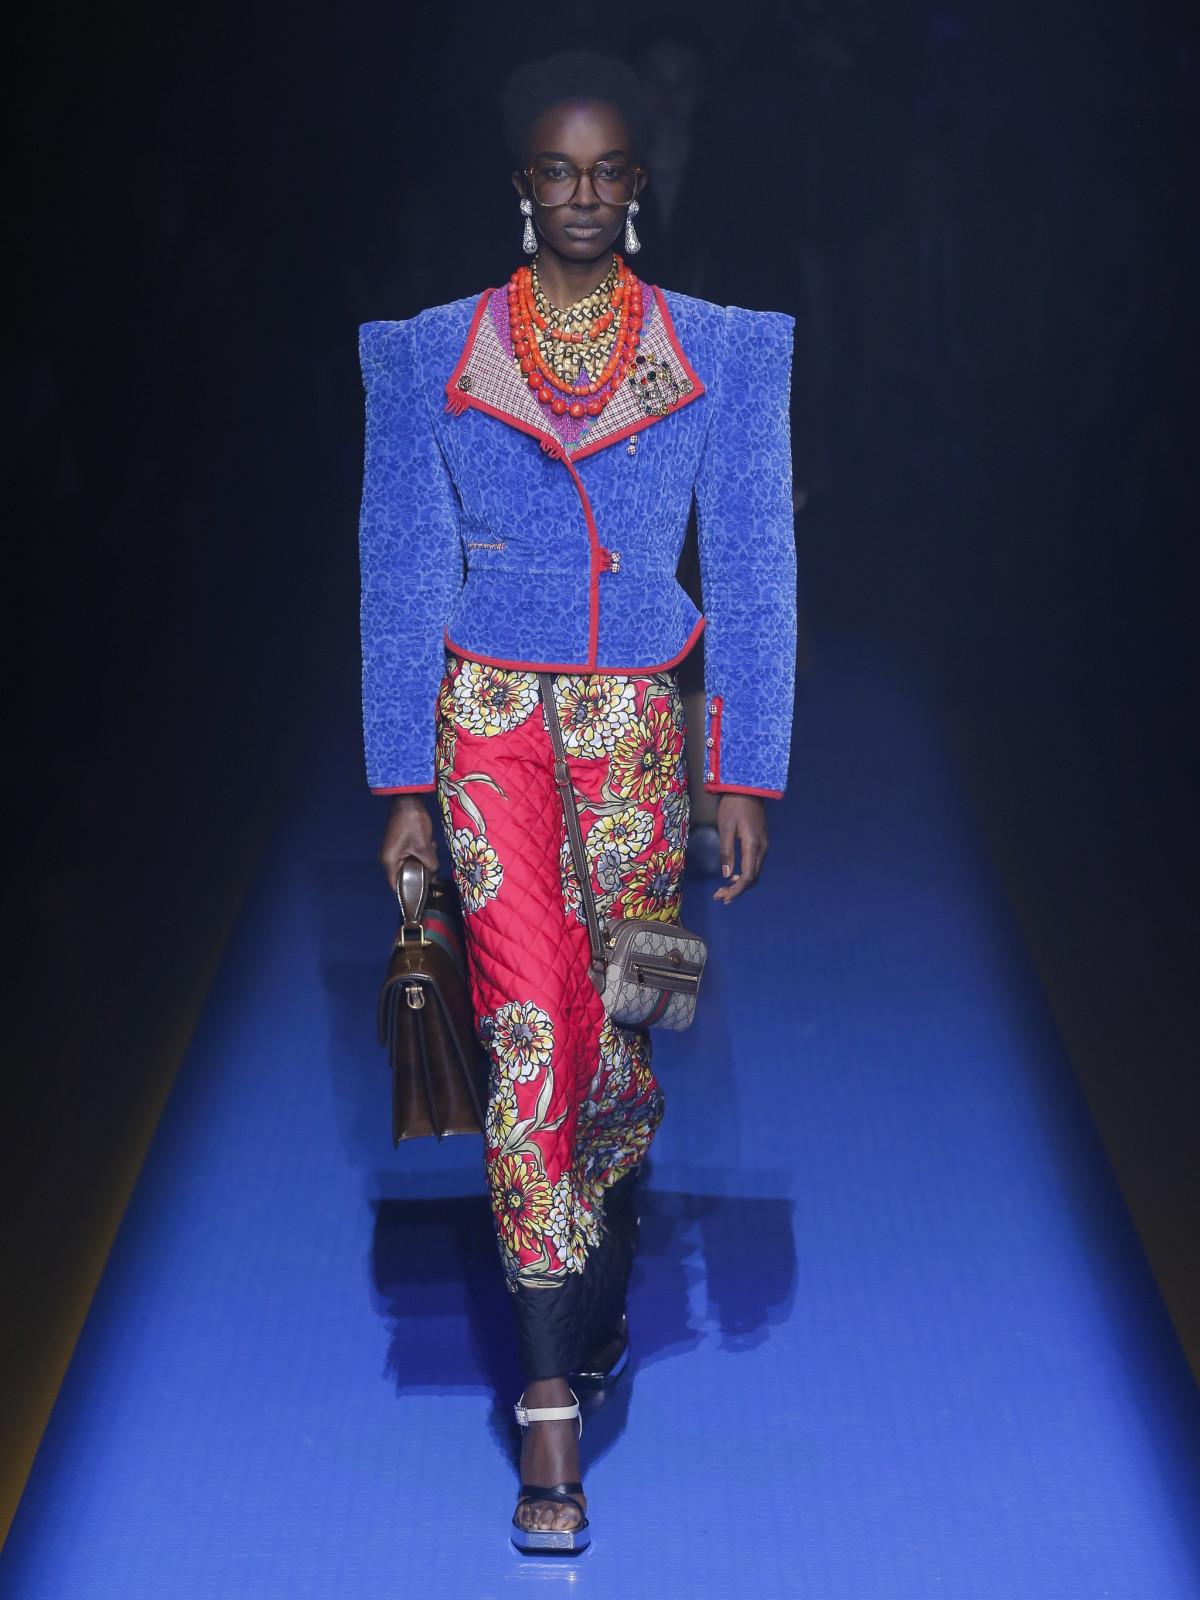 f1ffc8ef005 Milan Fashion Week: 39 cool looks from Gucci, Prada, Fendi, and more ...